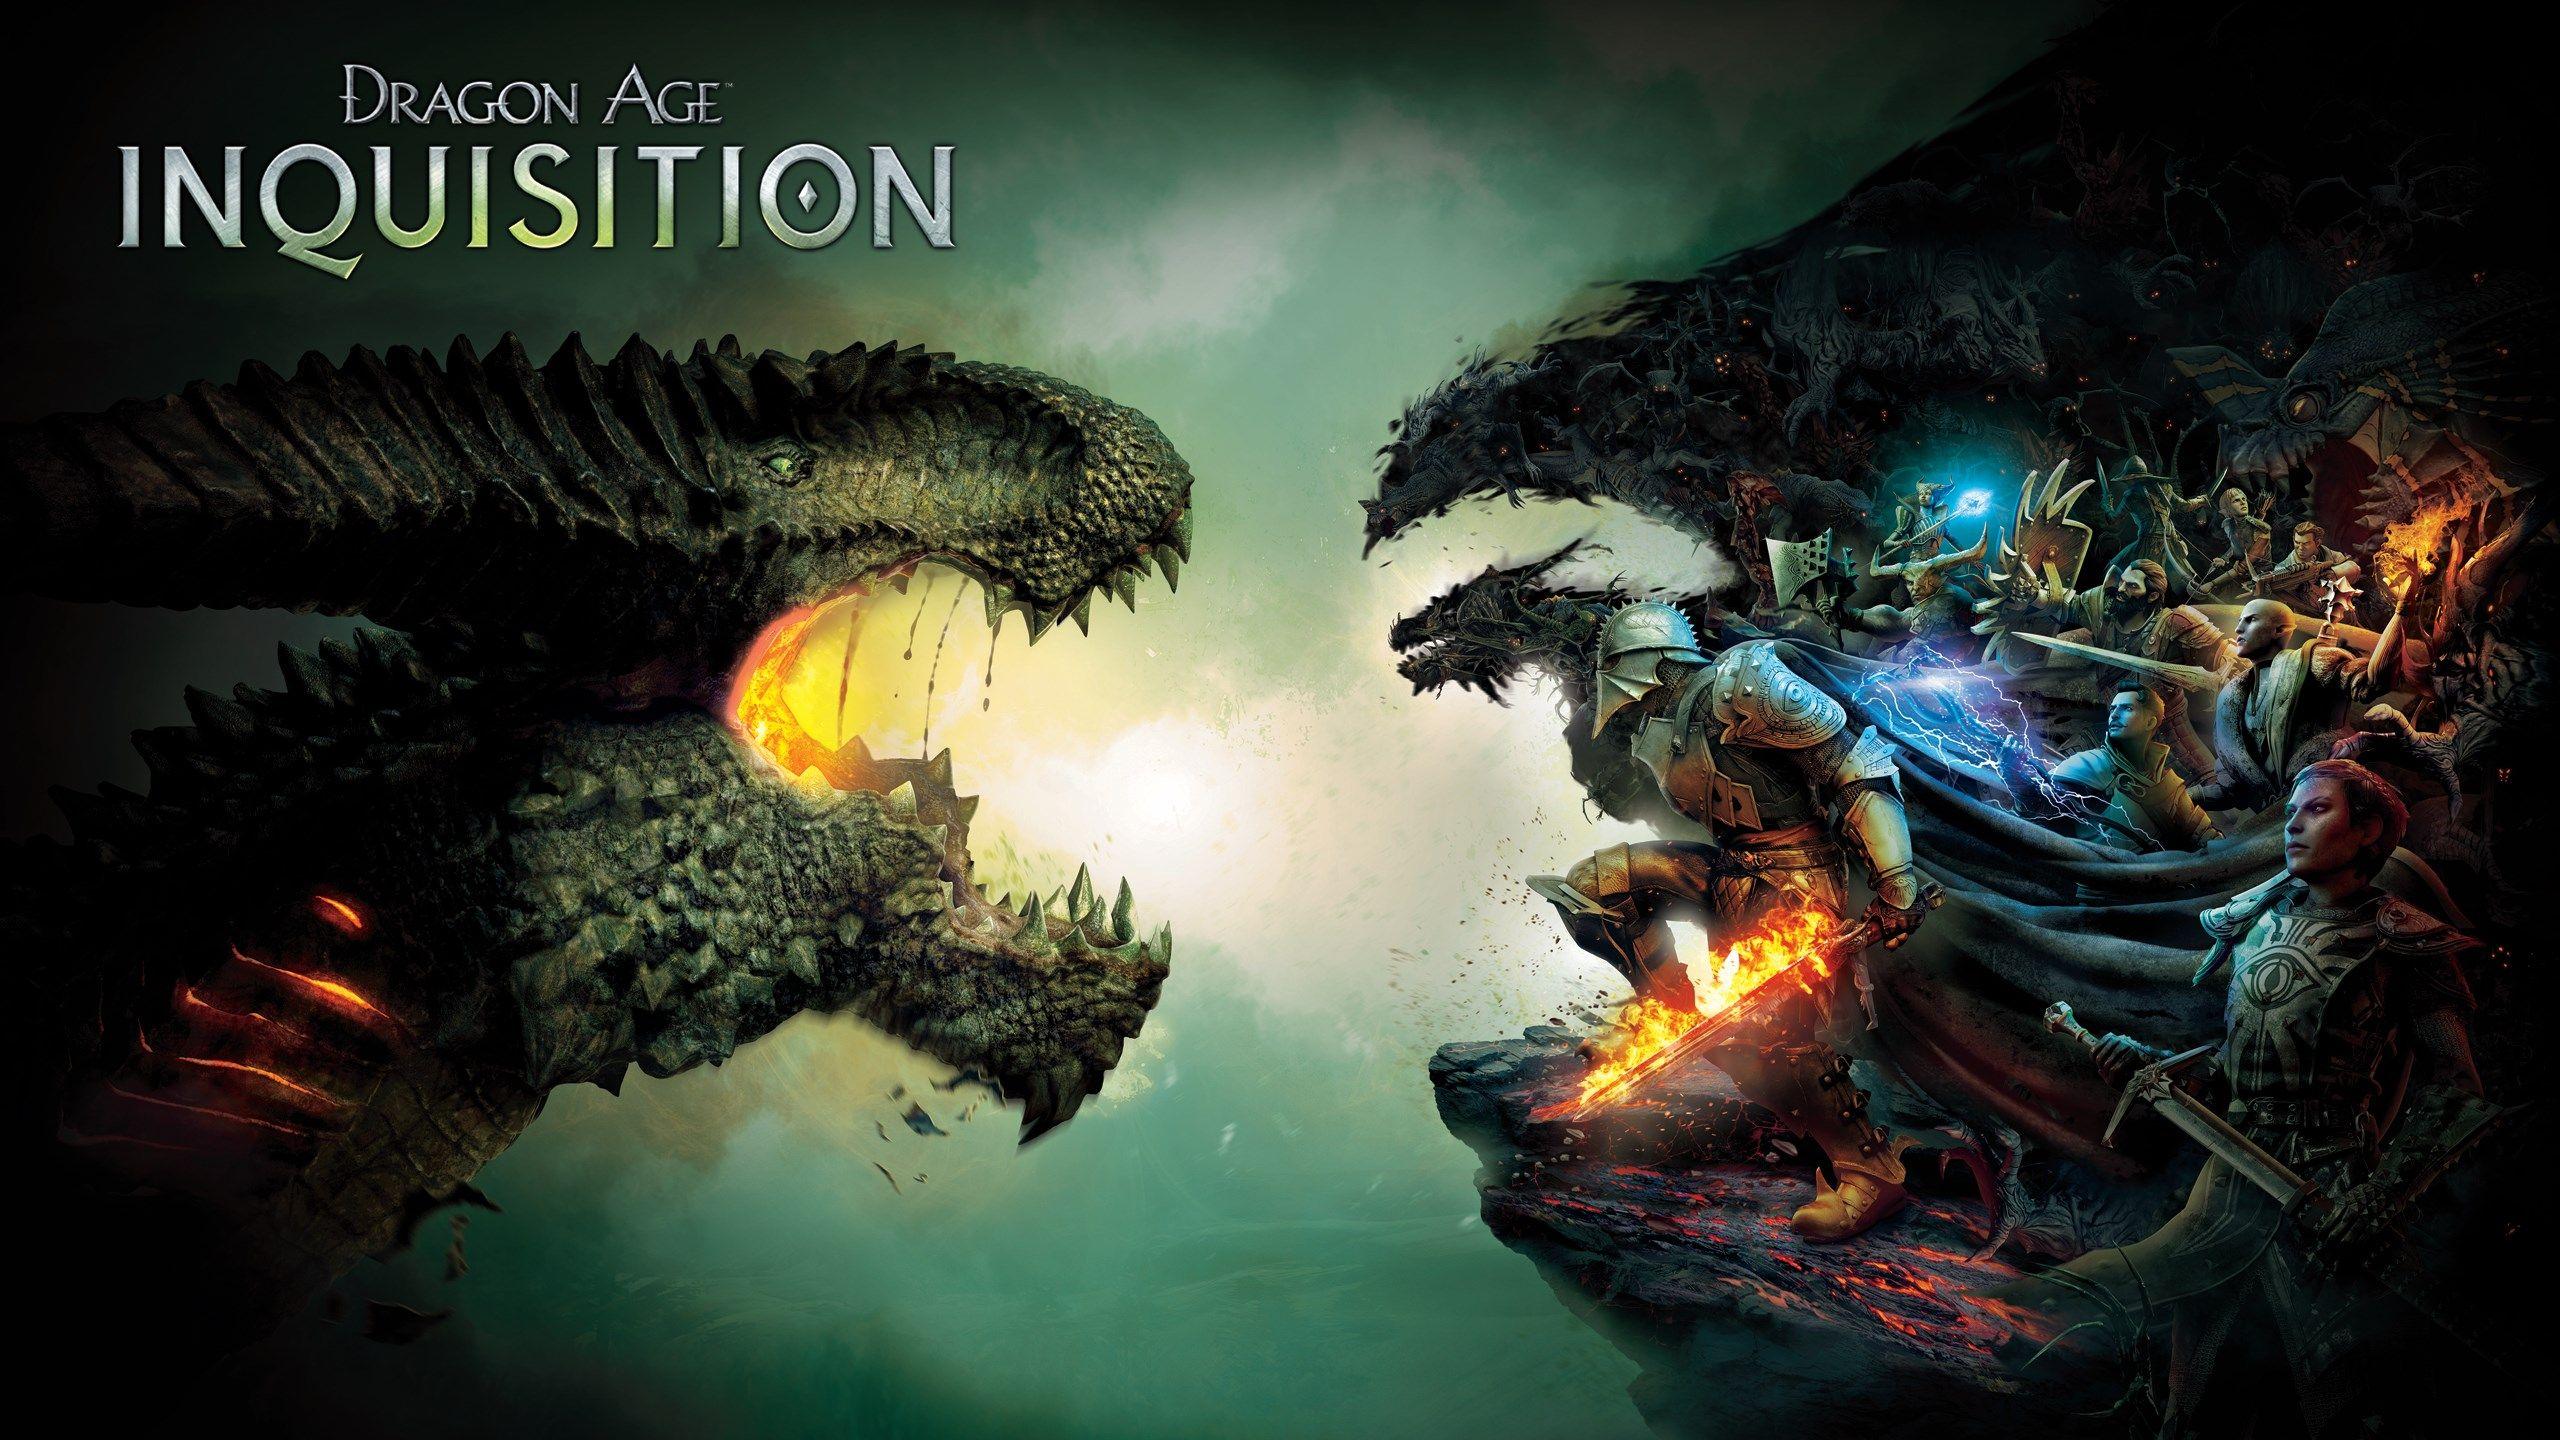 2560x1440 Dragon Age Inquisition Game Wallpaper Dragon Age Inquisition Dragon Age Games Dragon Age